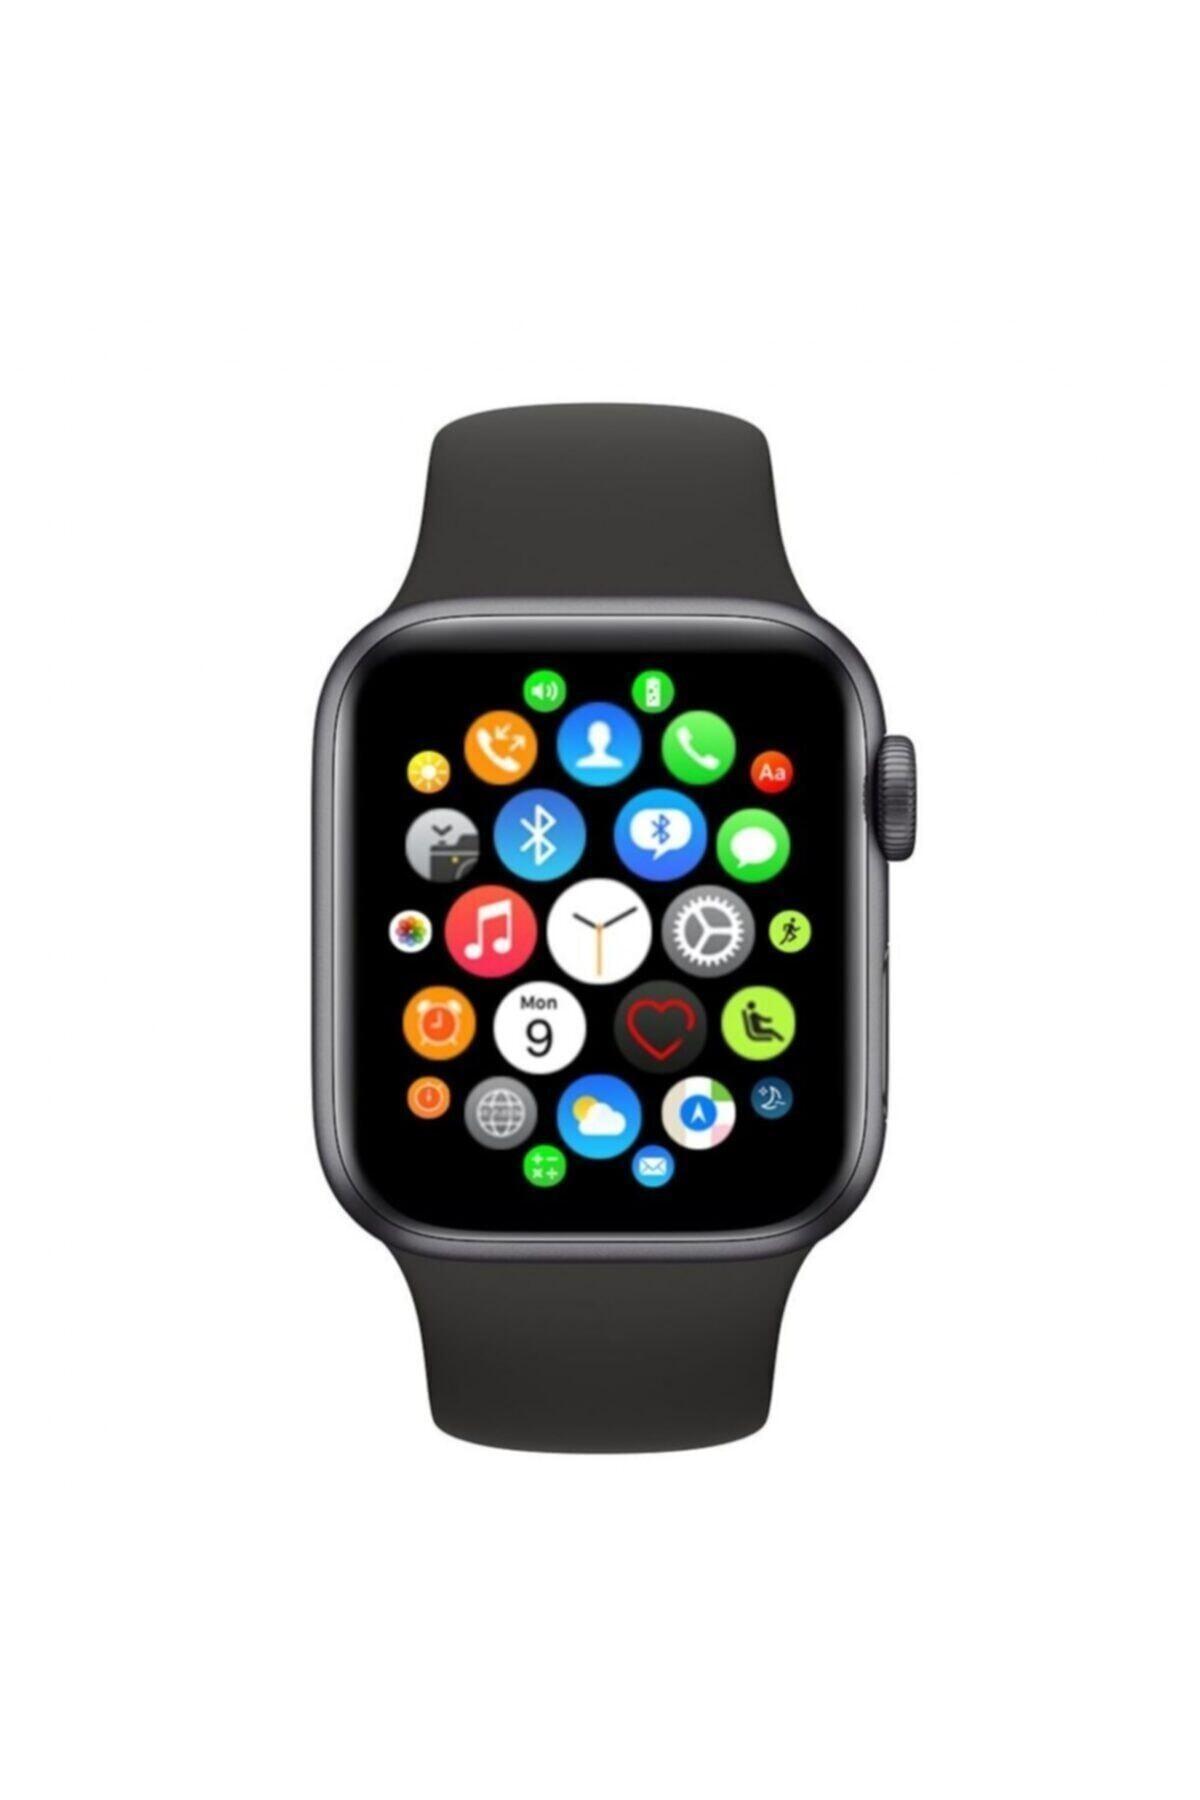 OWWOTECH T500 Akıllı Saat Smart Watch Türkçe Arama Cevaplama Sporcu Saati 1